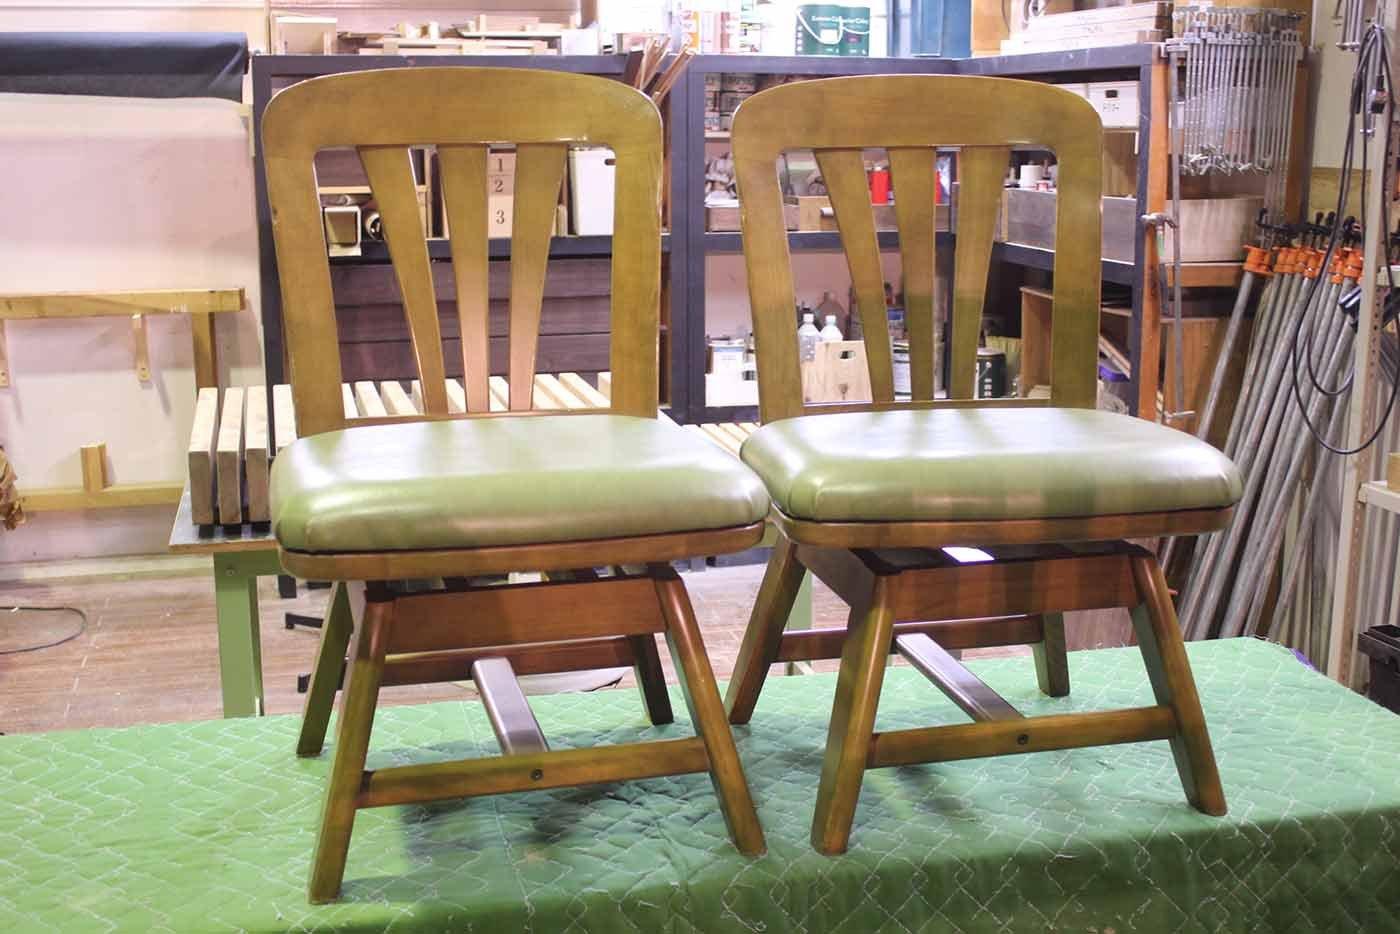 S様 椅子 座面張替え 修理